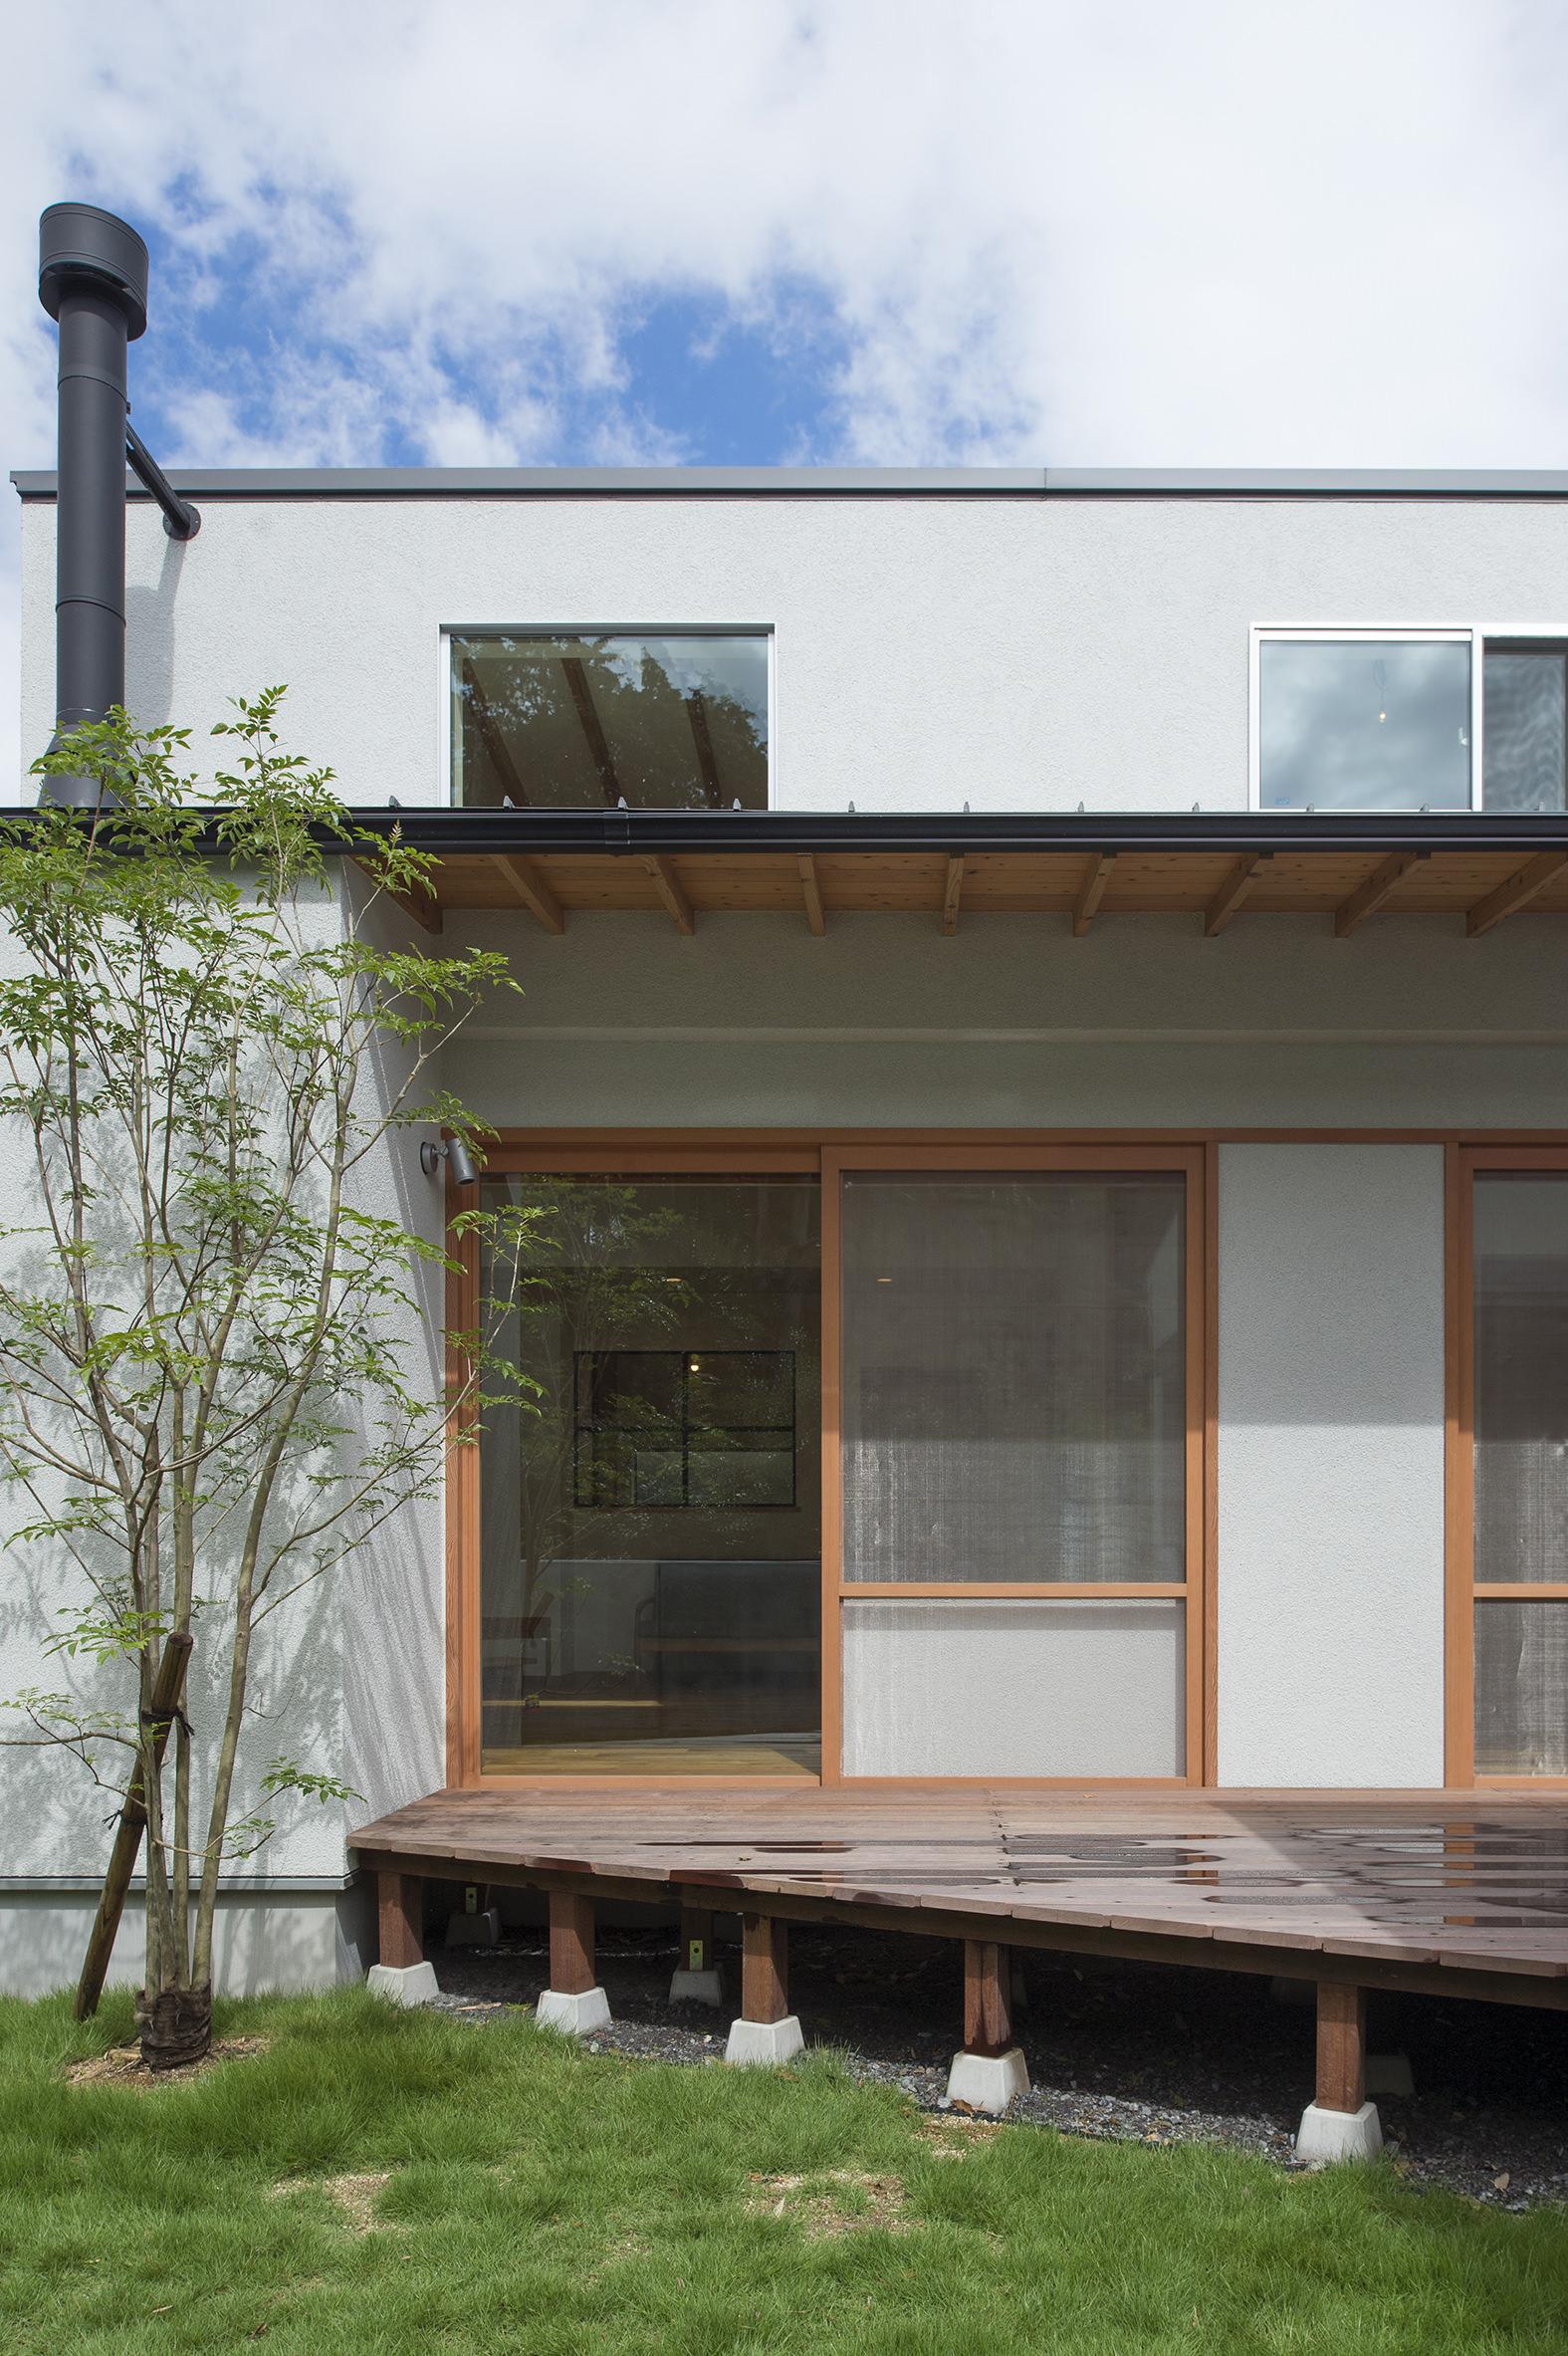 YOKUBARI HOUSE